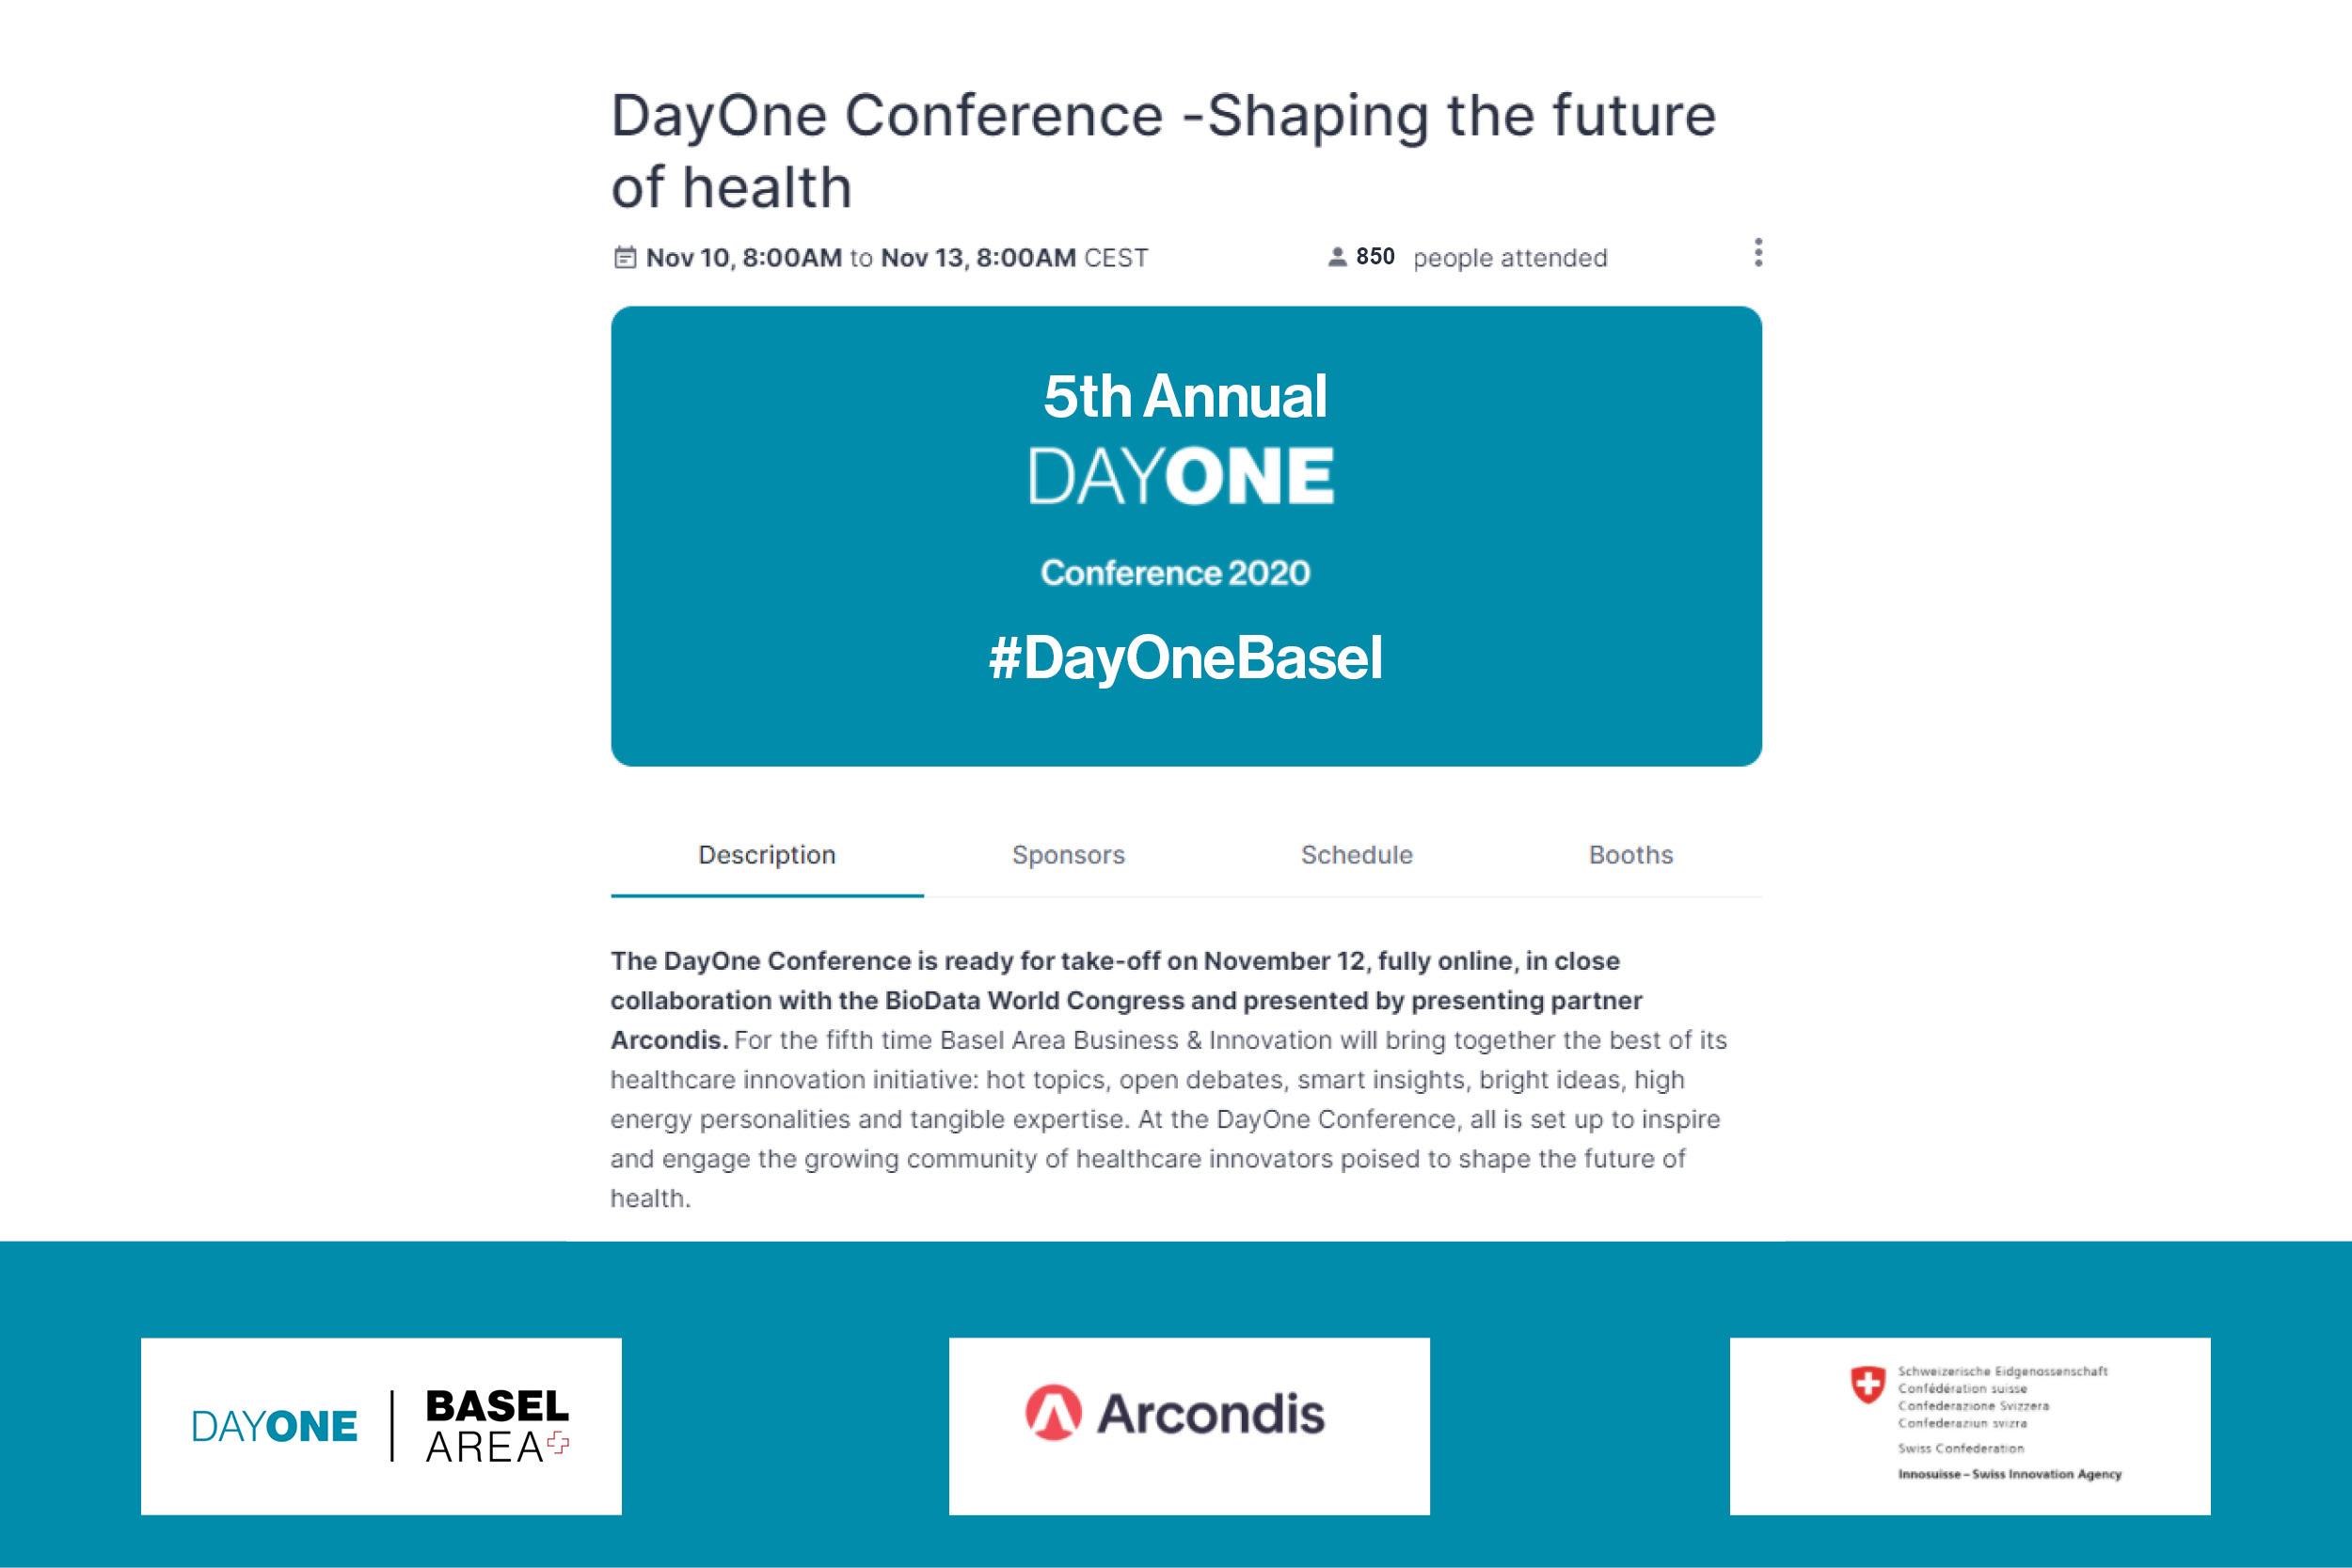 DayOne Conferece - Shaping the future of health